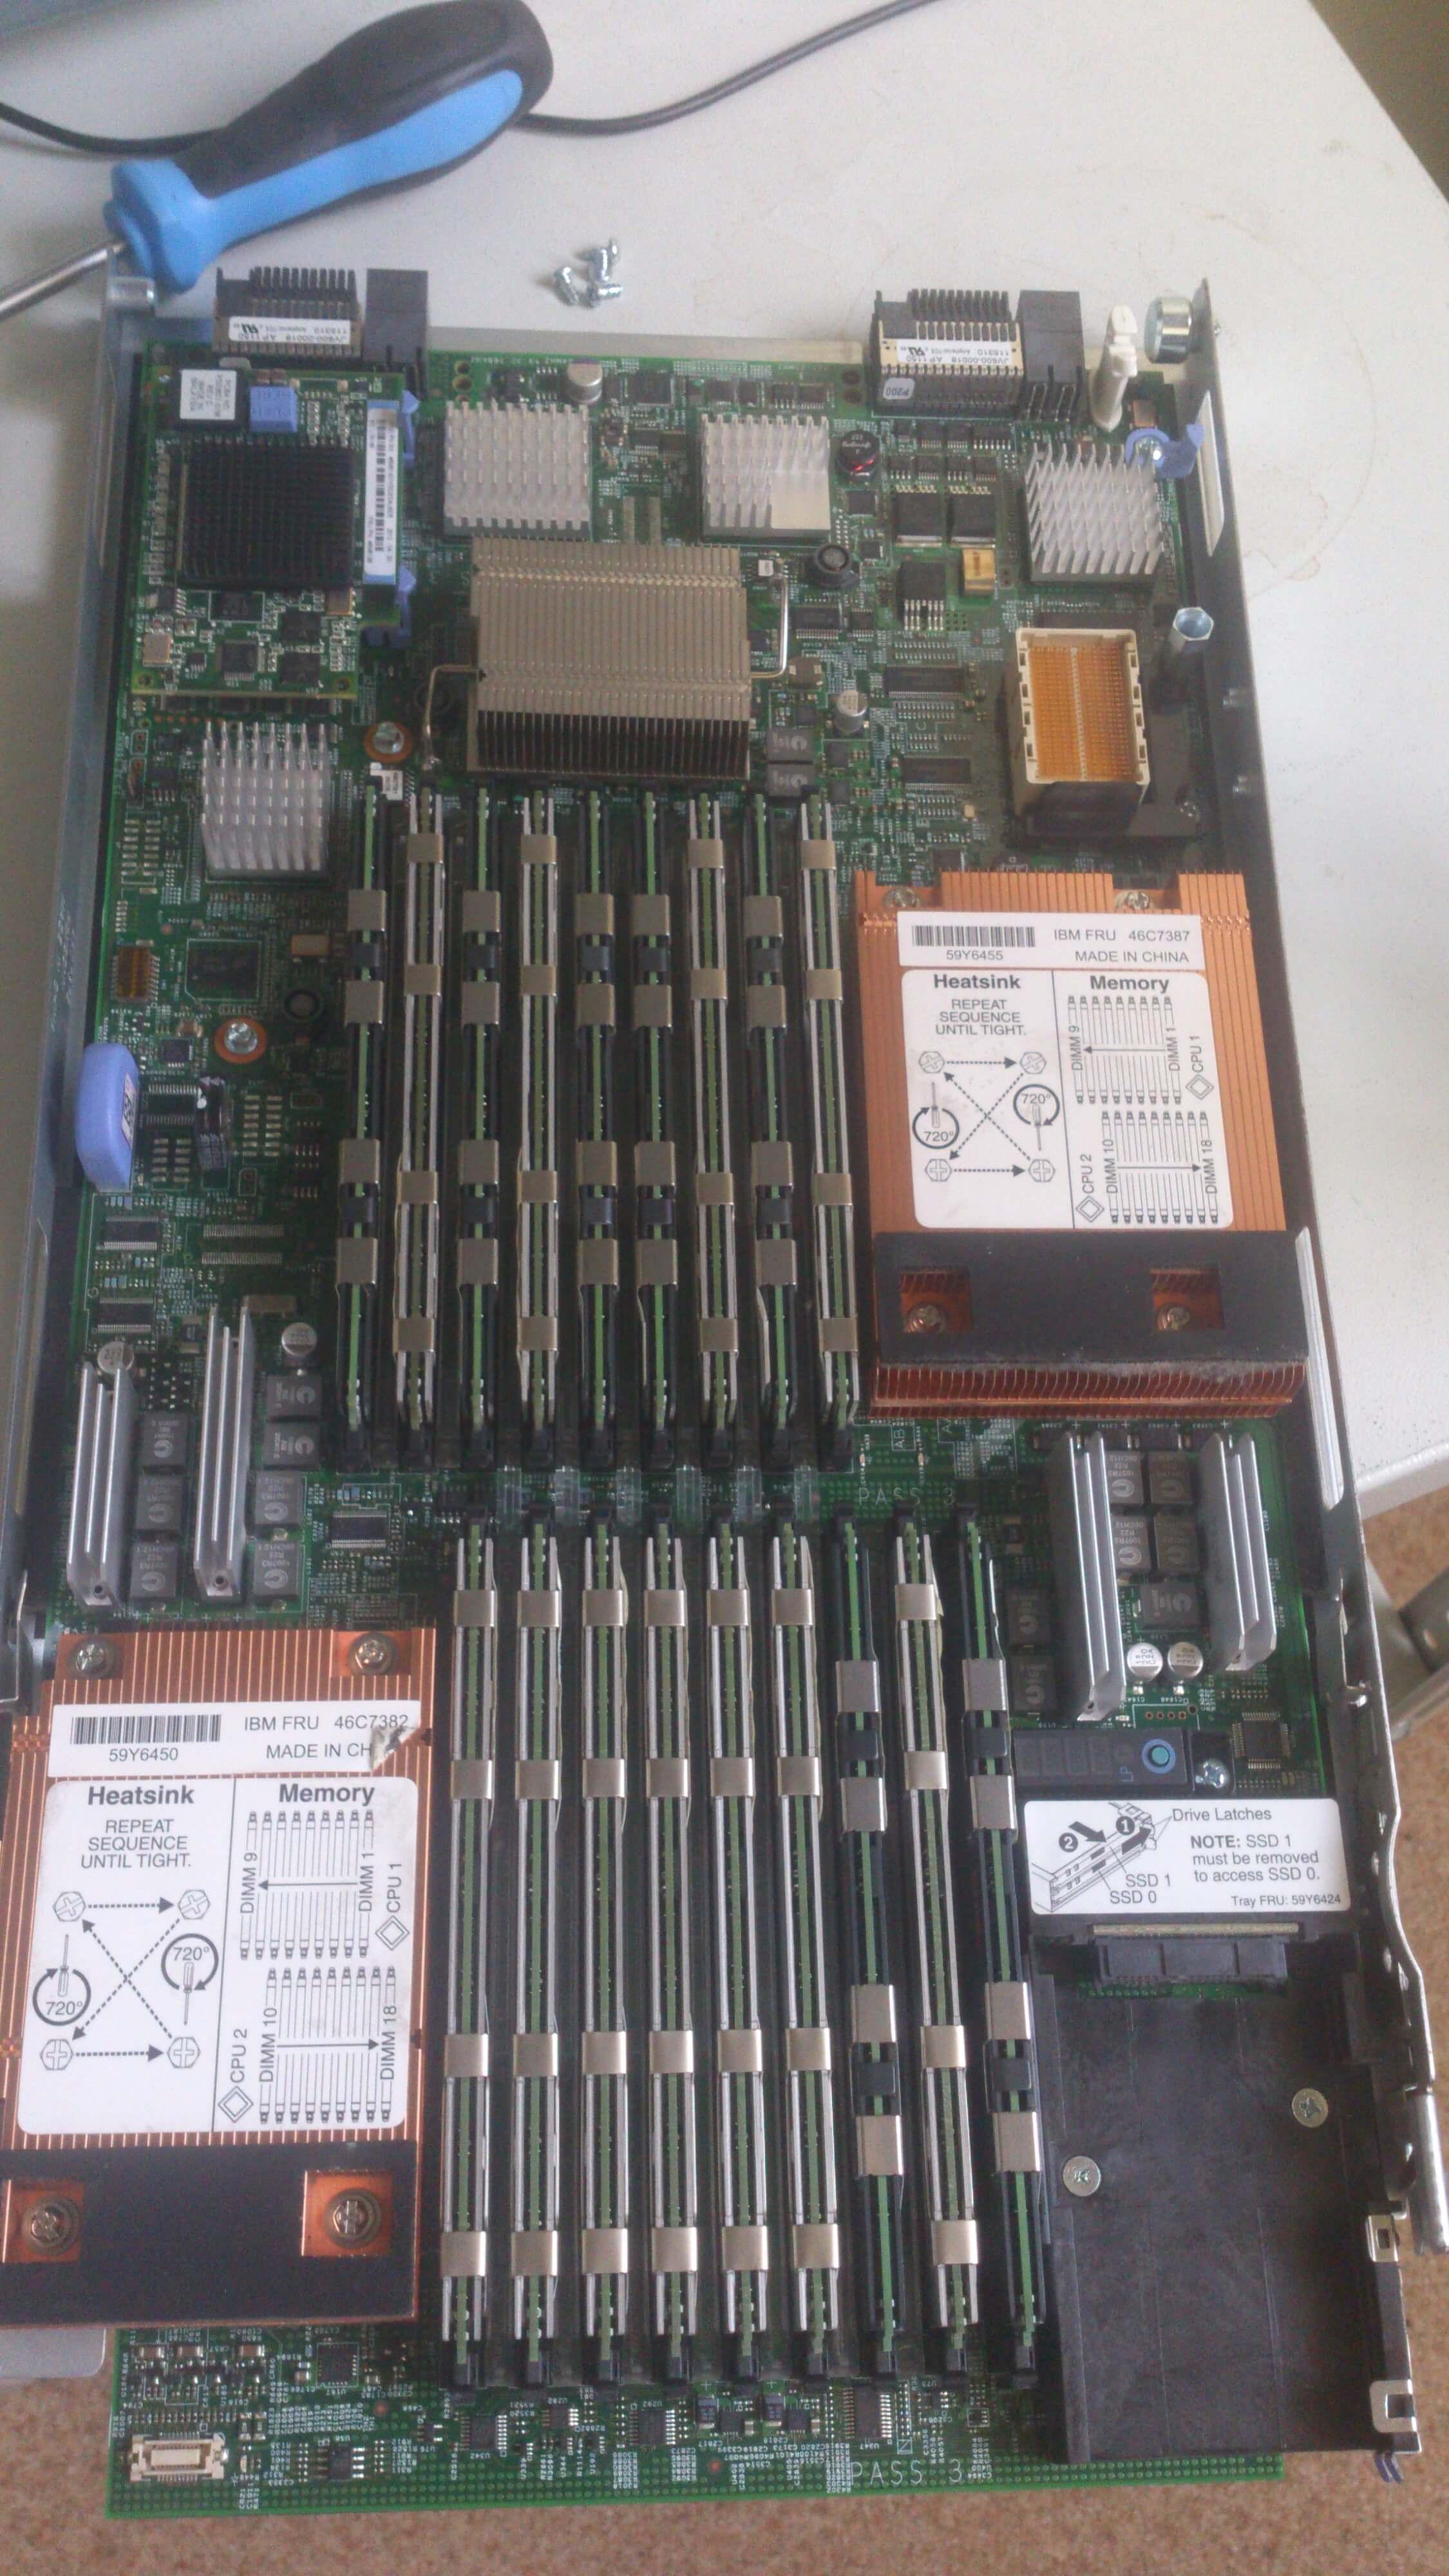 установка планки оперативной памяти